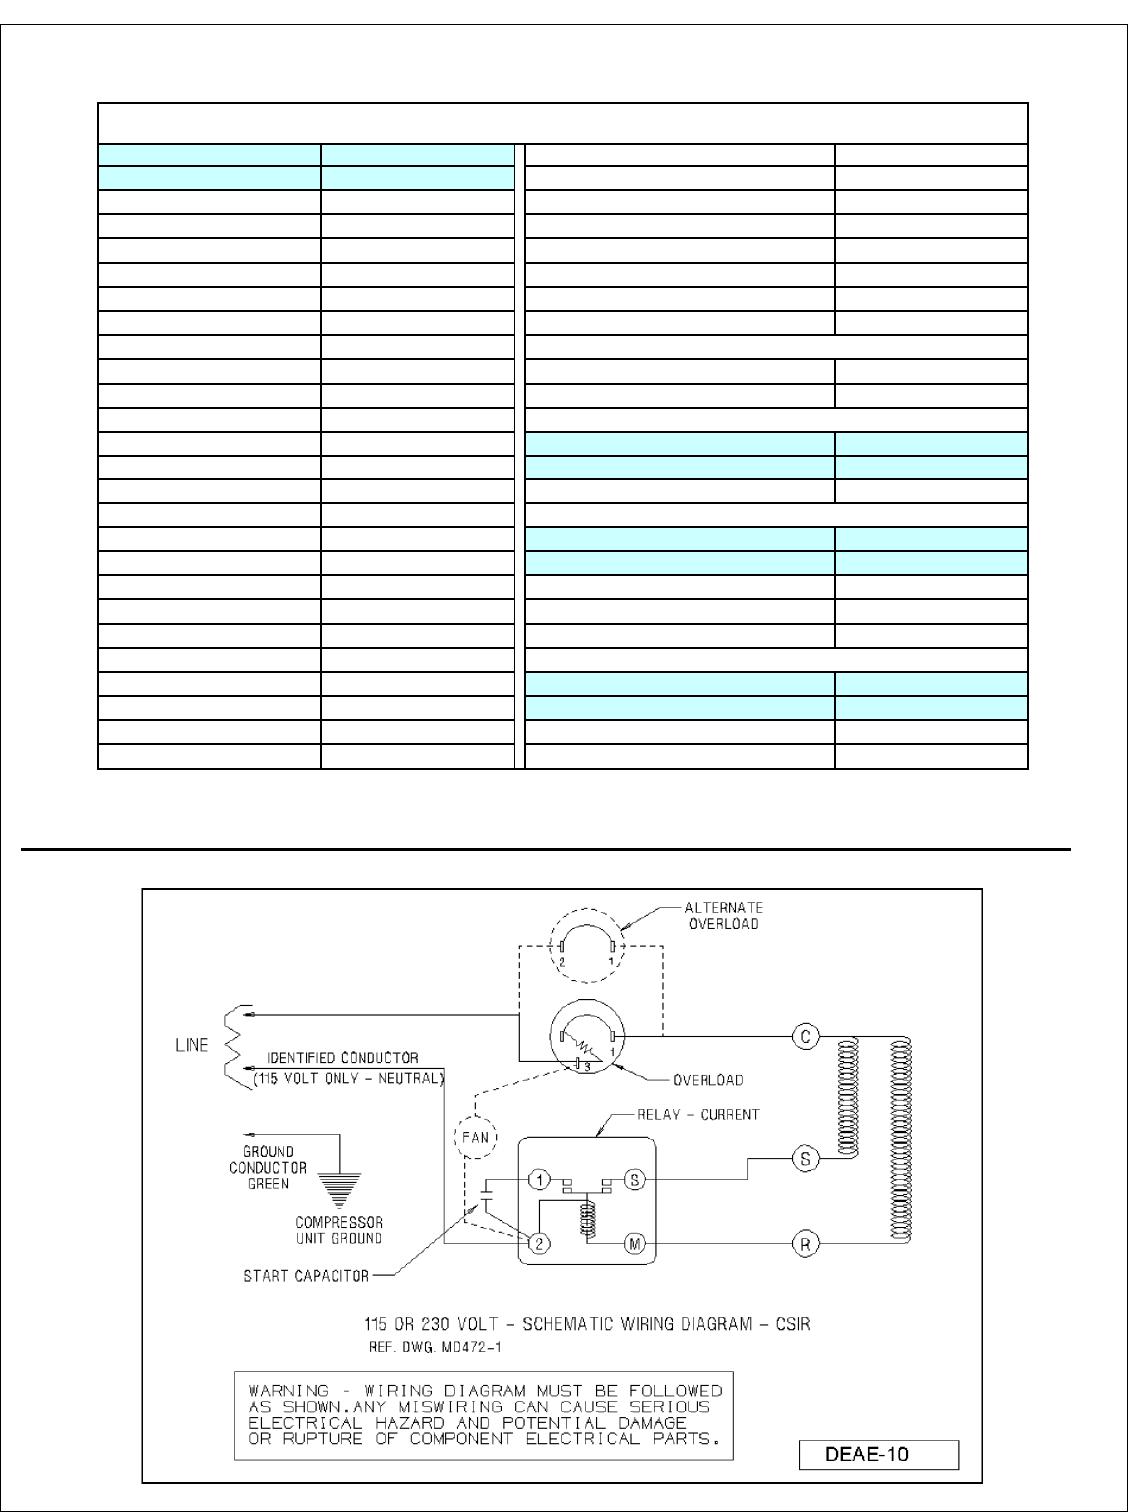 Tecumseh Compressor Start Relay Wiring Diagram from usermanual.wiki